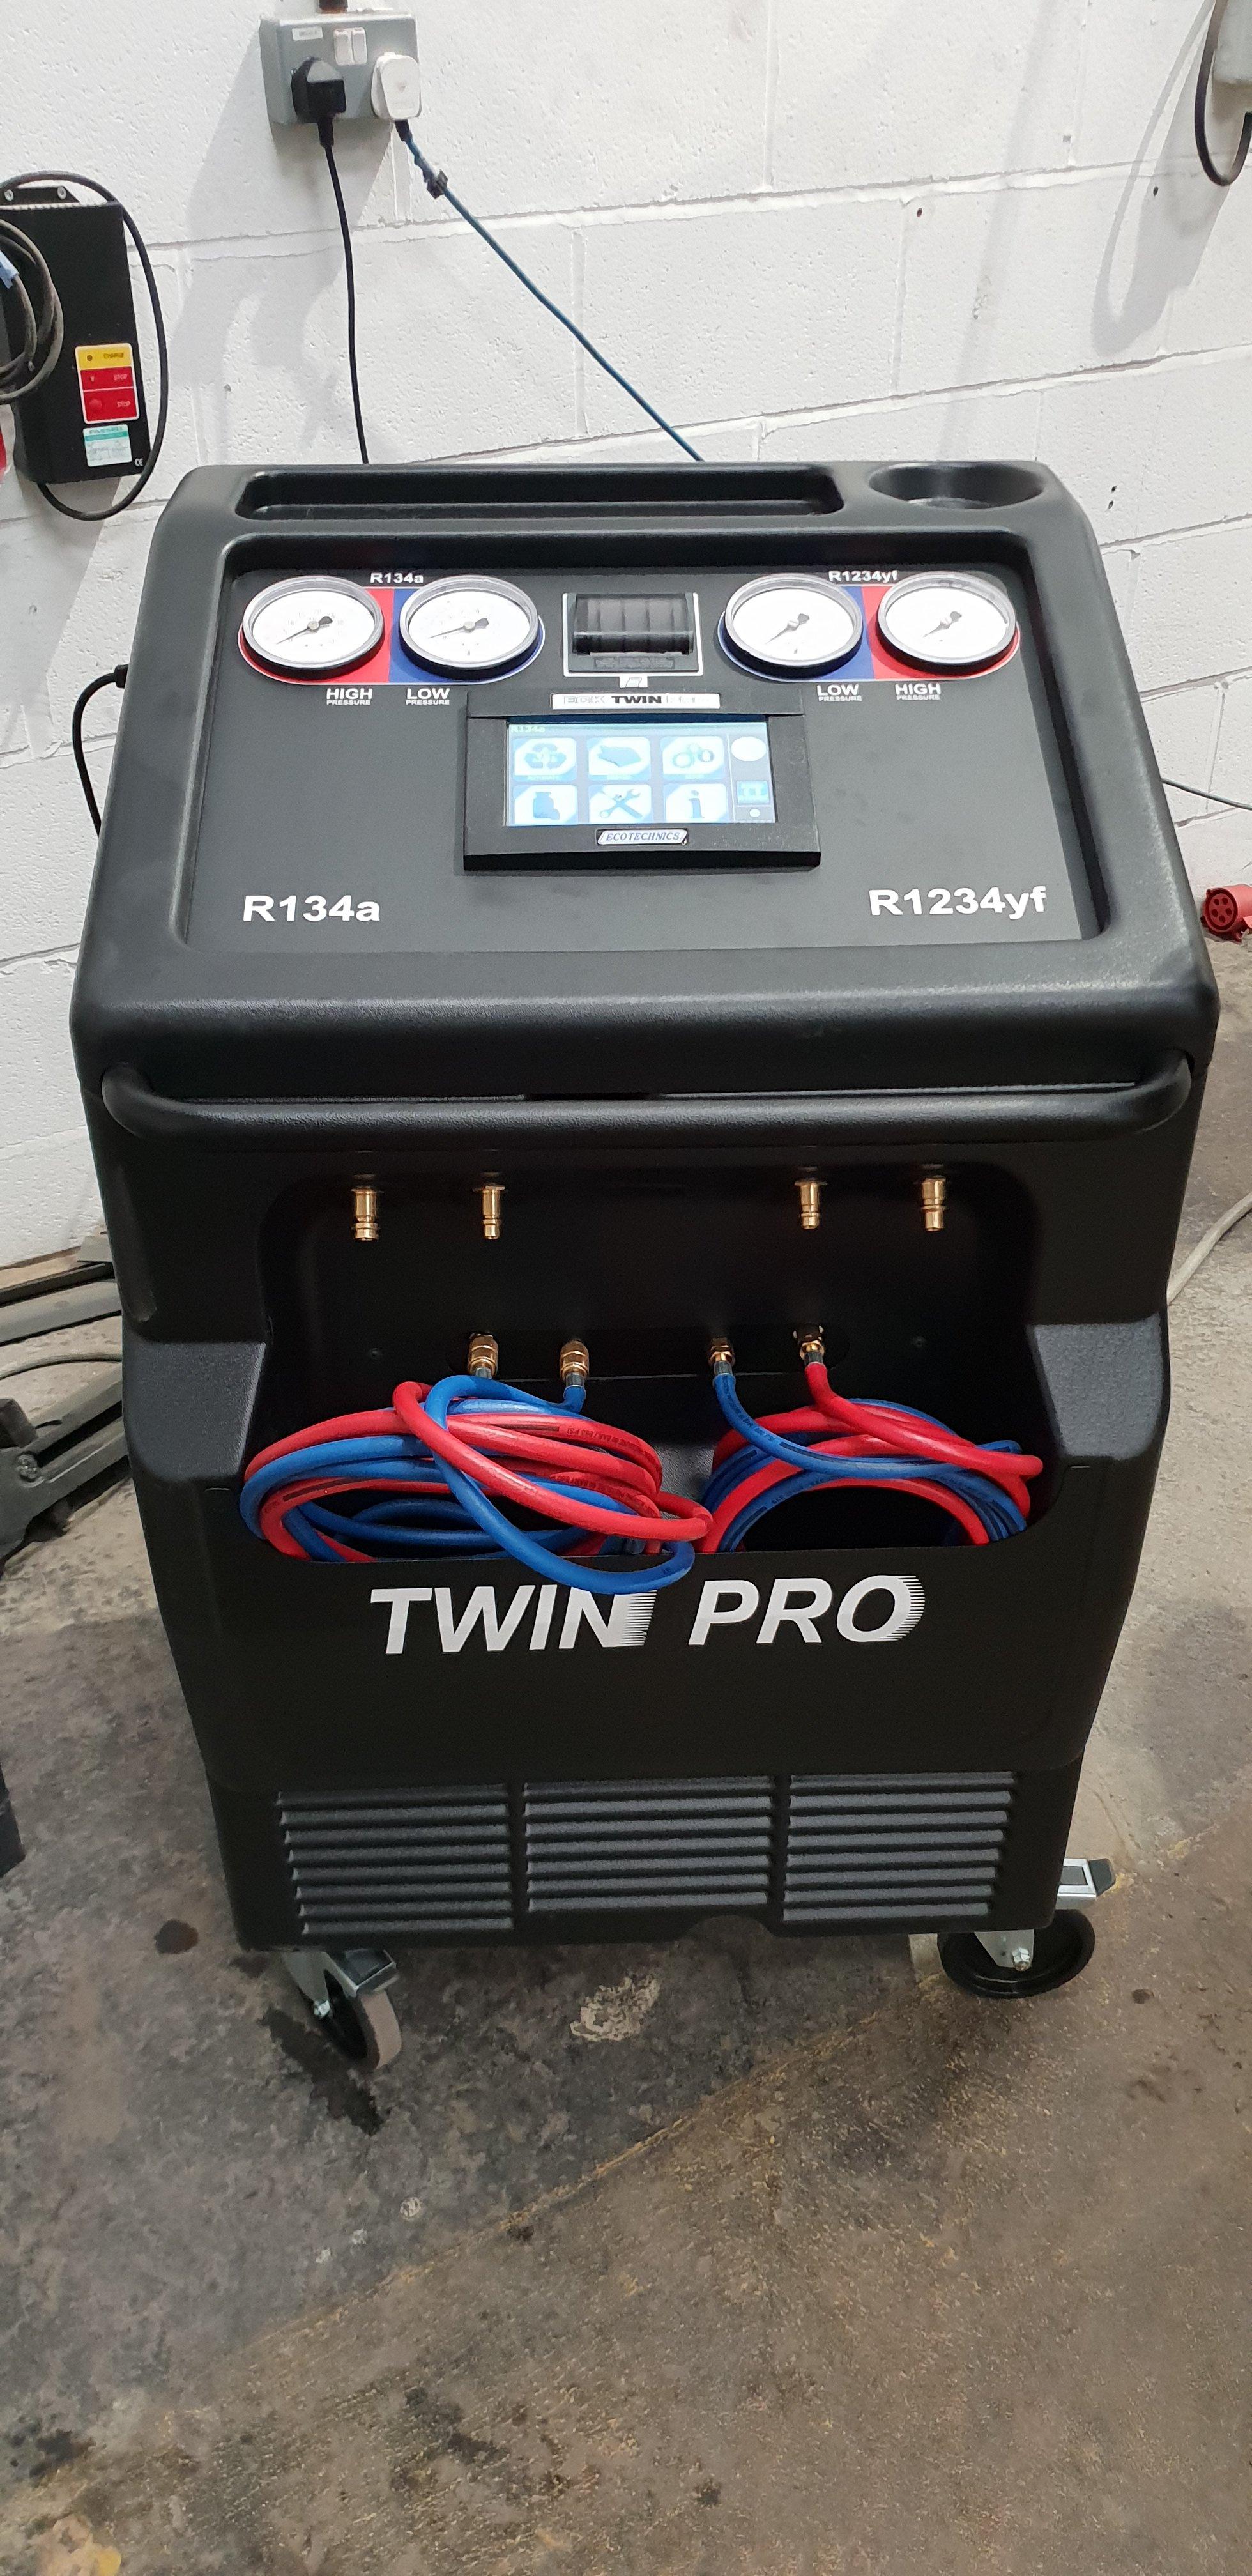 Air conditioning recharging station - Repair & Restore Body Shop